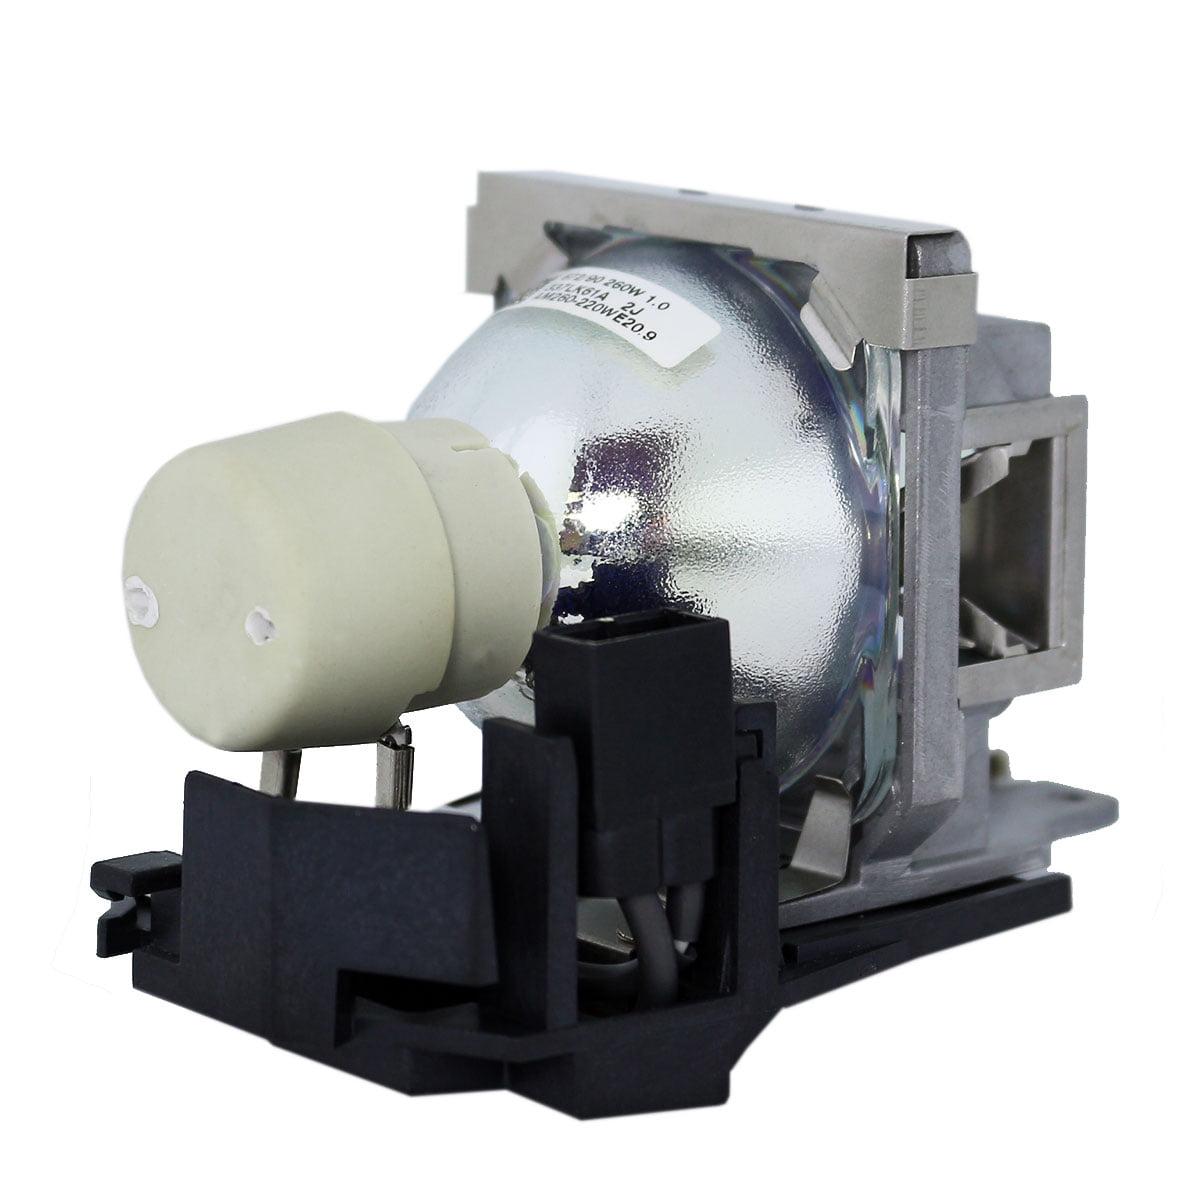 Lutema Platinum Bulb for BenQ MP711c Projector Lamp (Original Philips Inside) - image 2 of 5